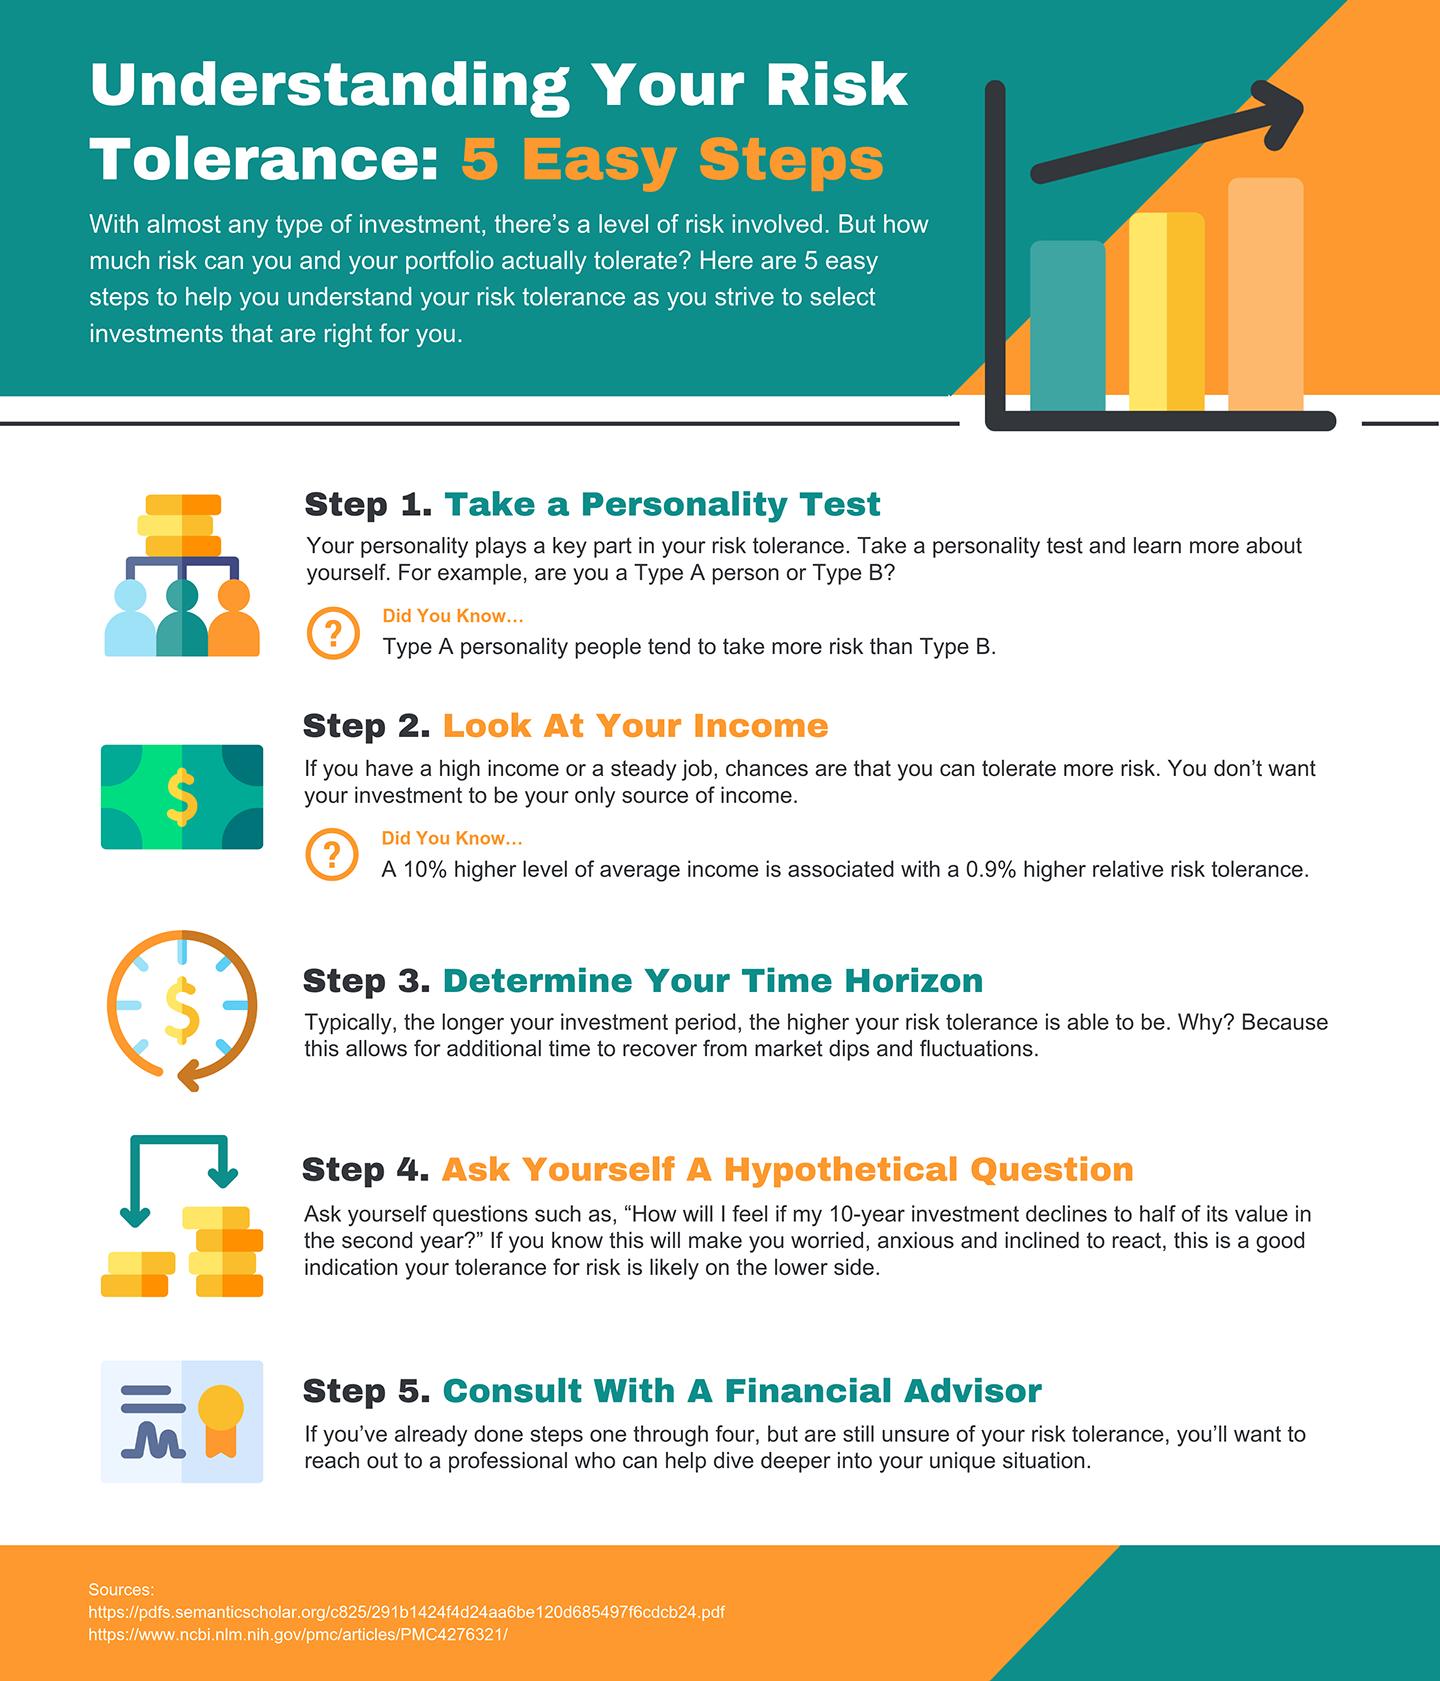 Understanding Your Risk Tolerance: 5 Easy Steps - Infographic Thumbnail